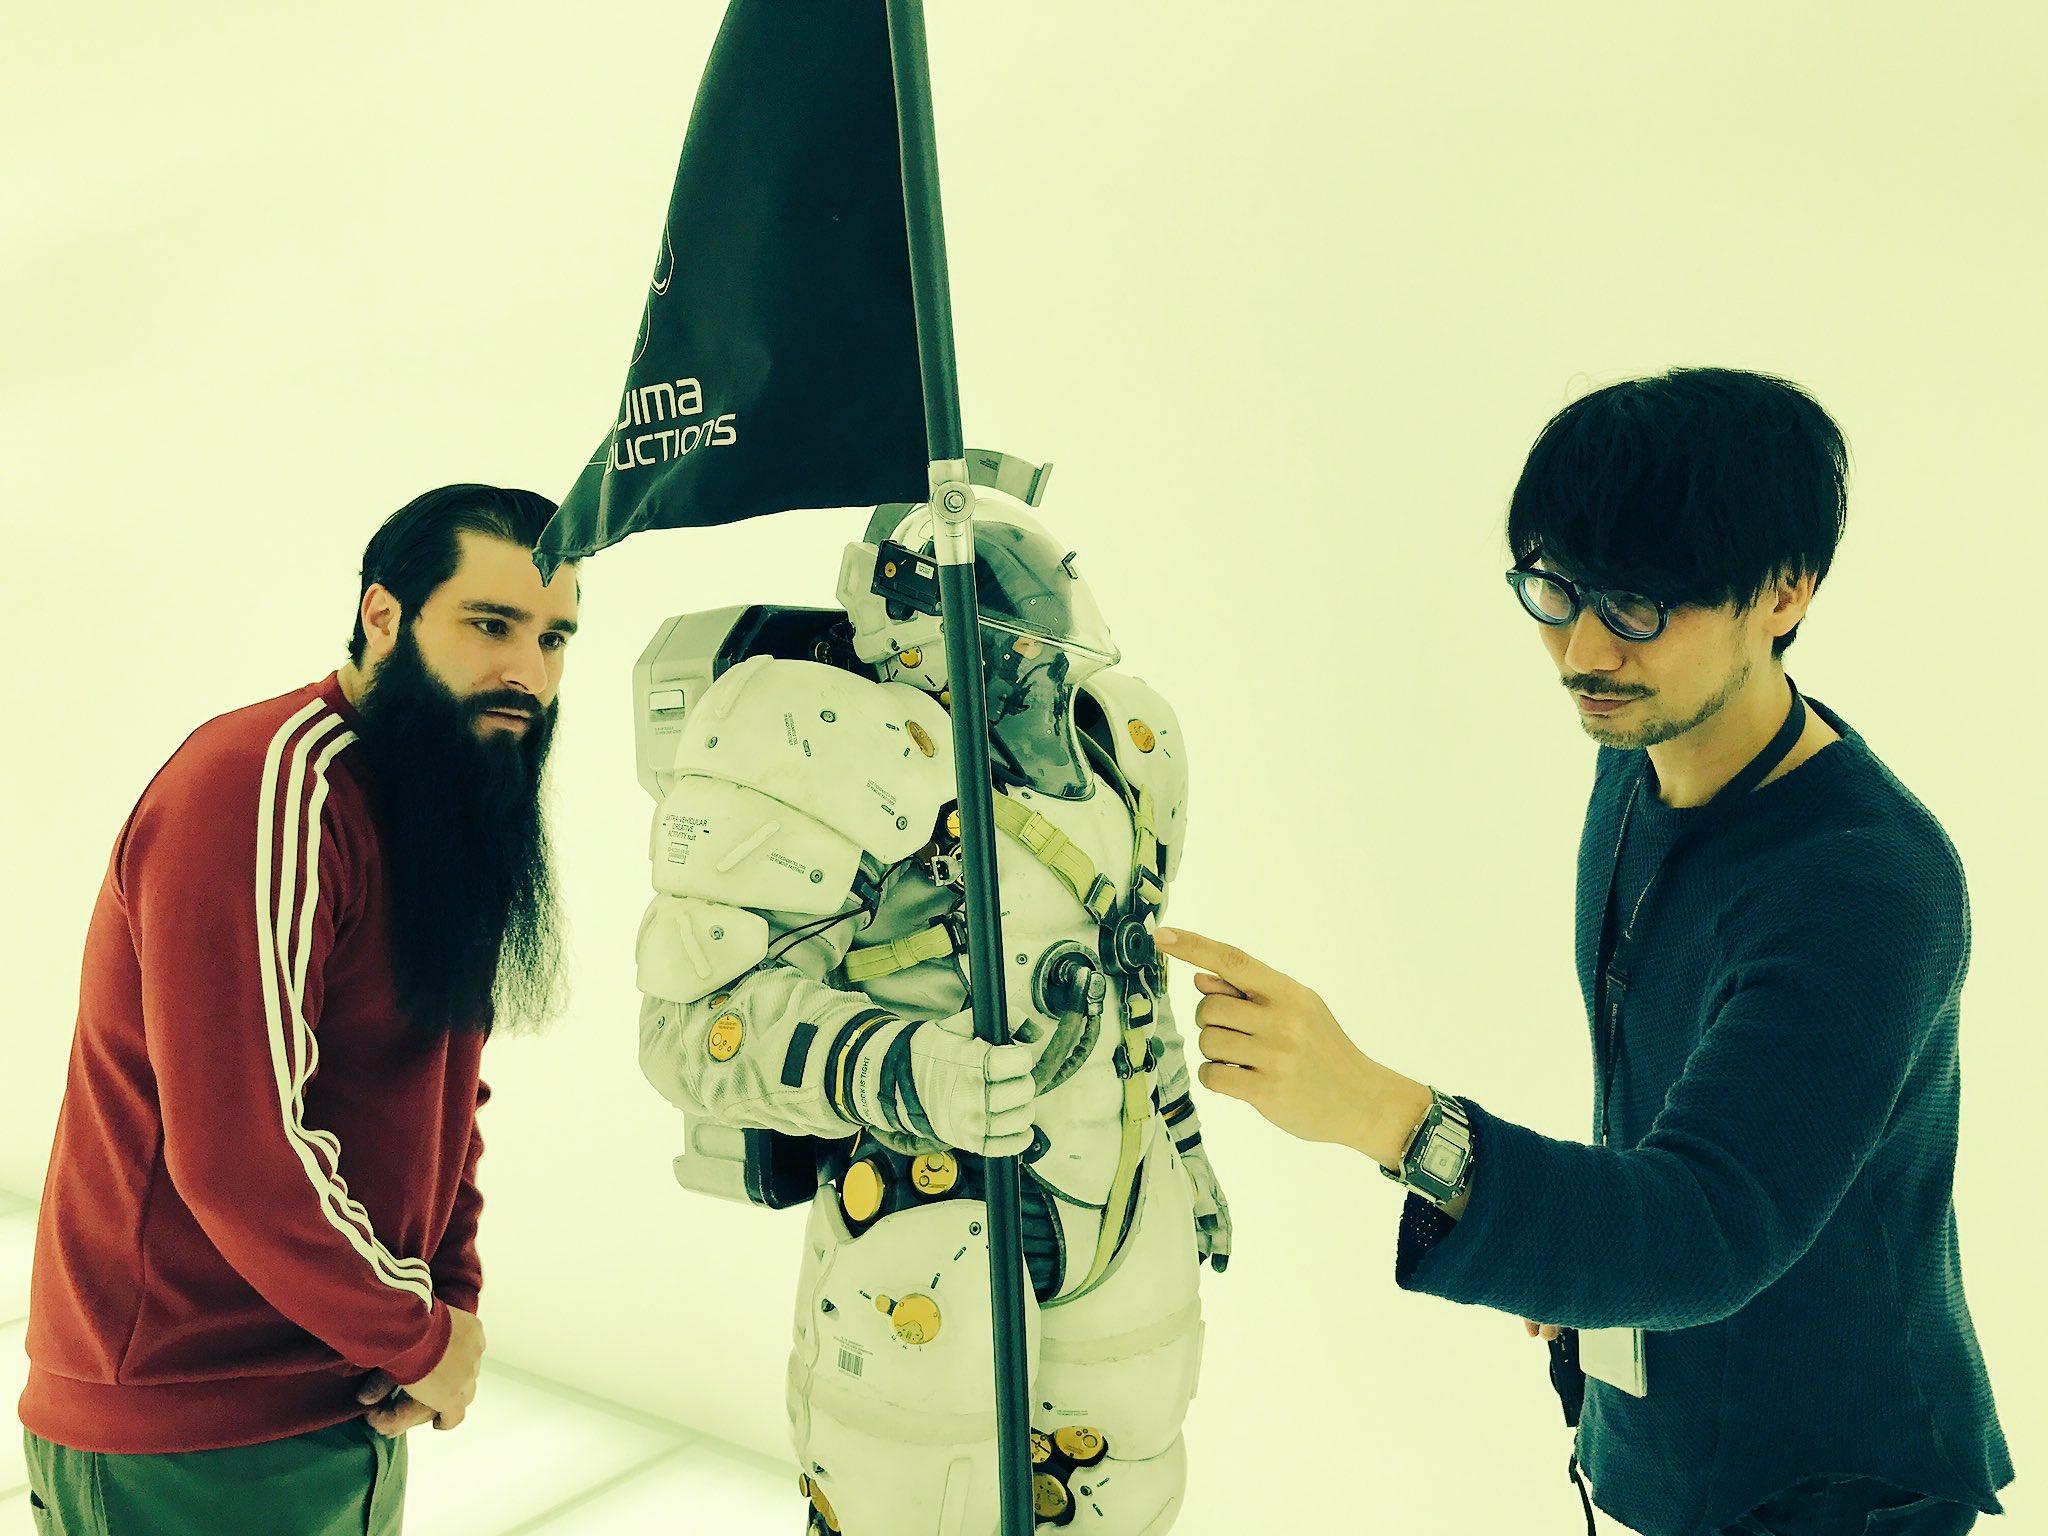 Jordan Vogt-Roberts, Ludens et Hideo Kojima, le 10 février 2017